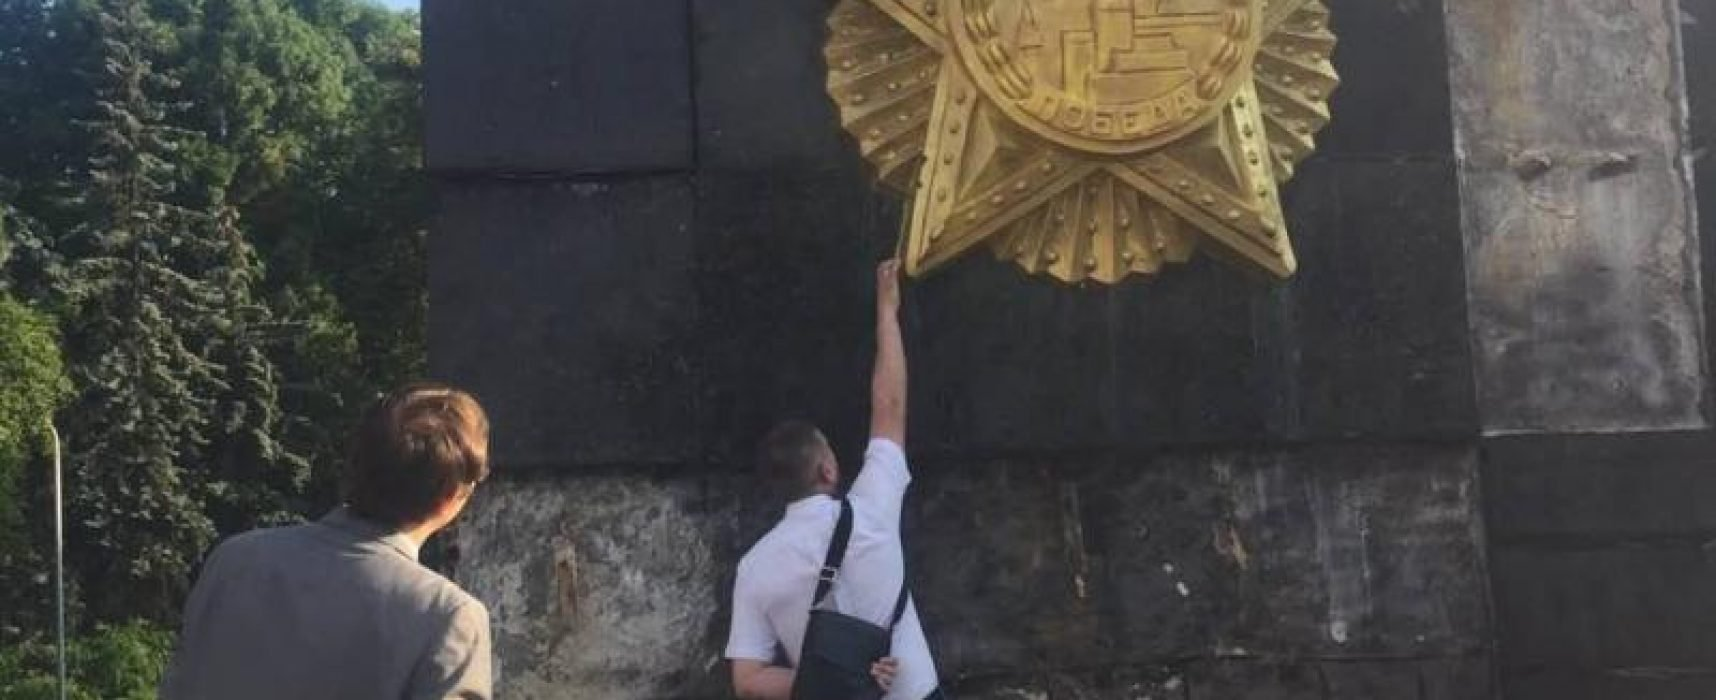 Fake: Lviv to Demolish WWII Glory Monument